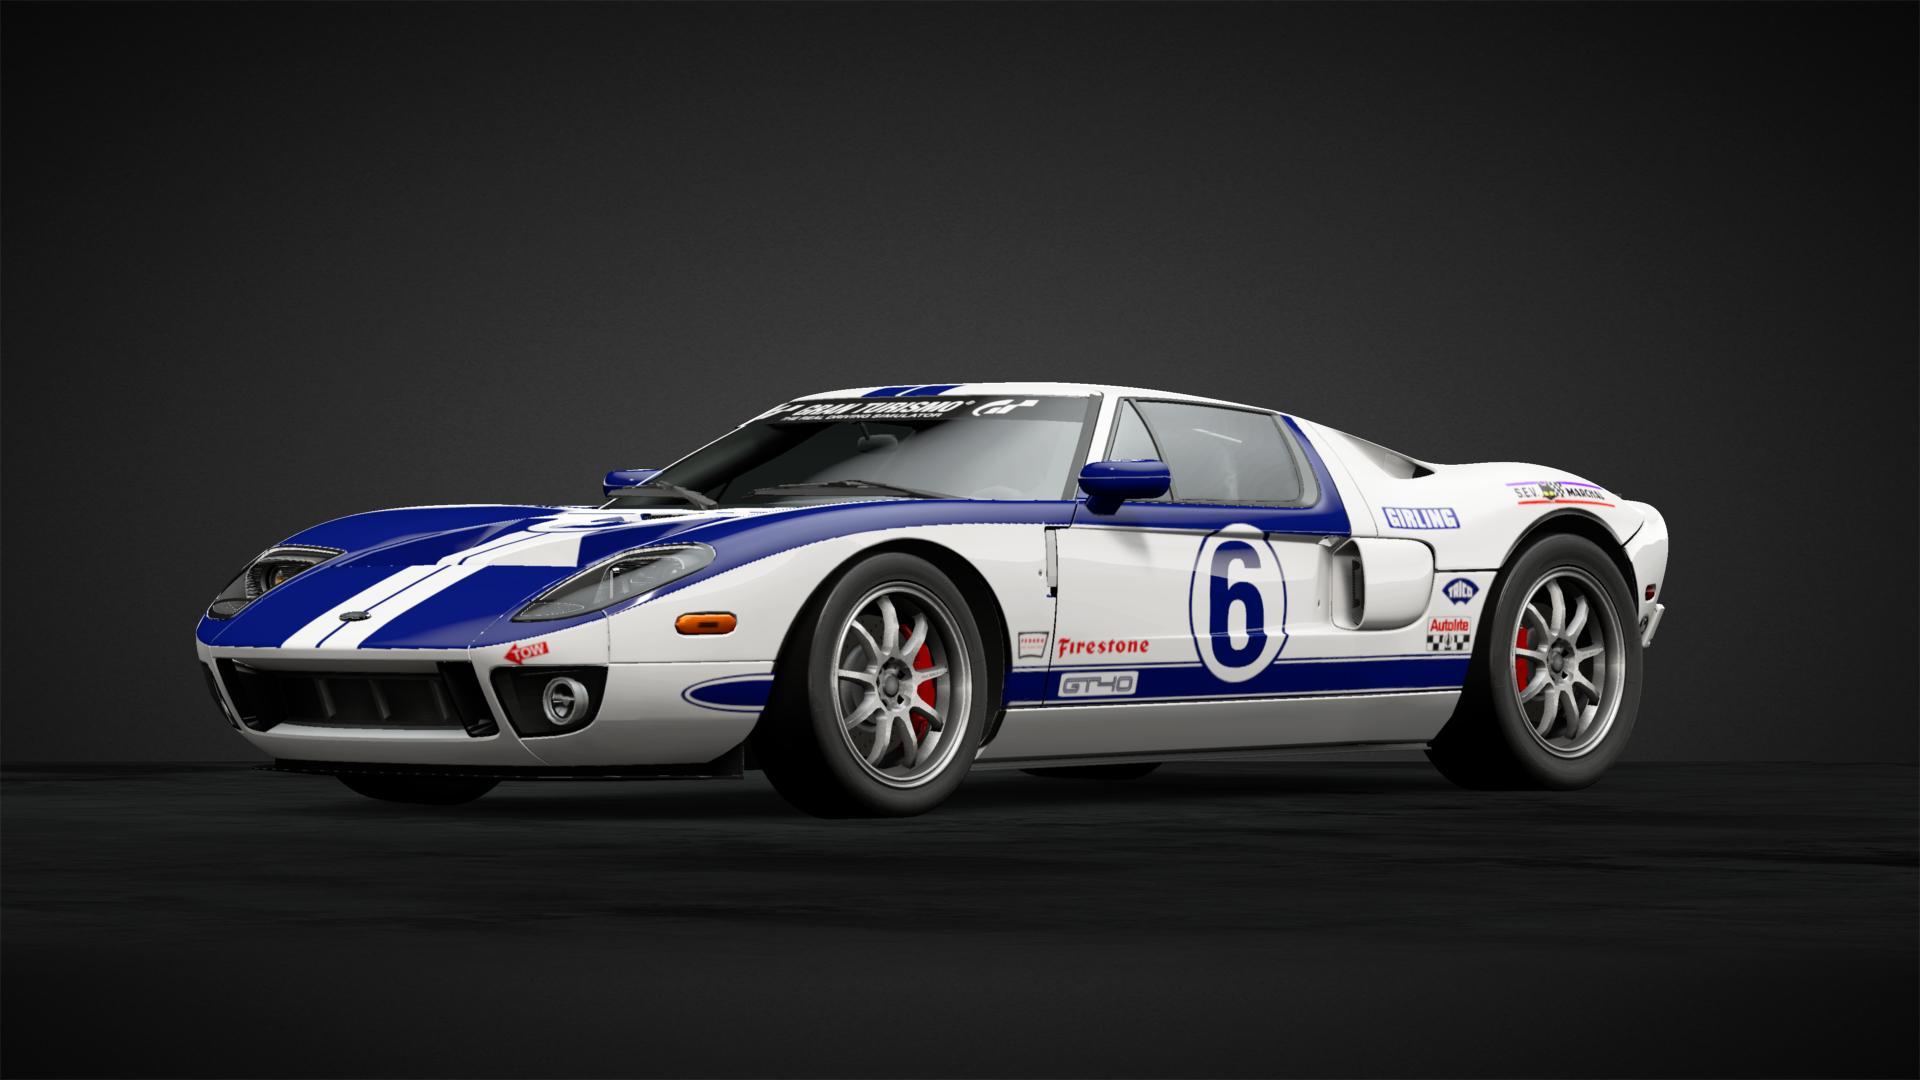 Gt Mark Iv Retro Livery Final Car Livery By Gearmeister Community Gran Turismo Sport